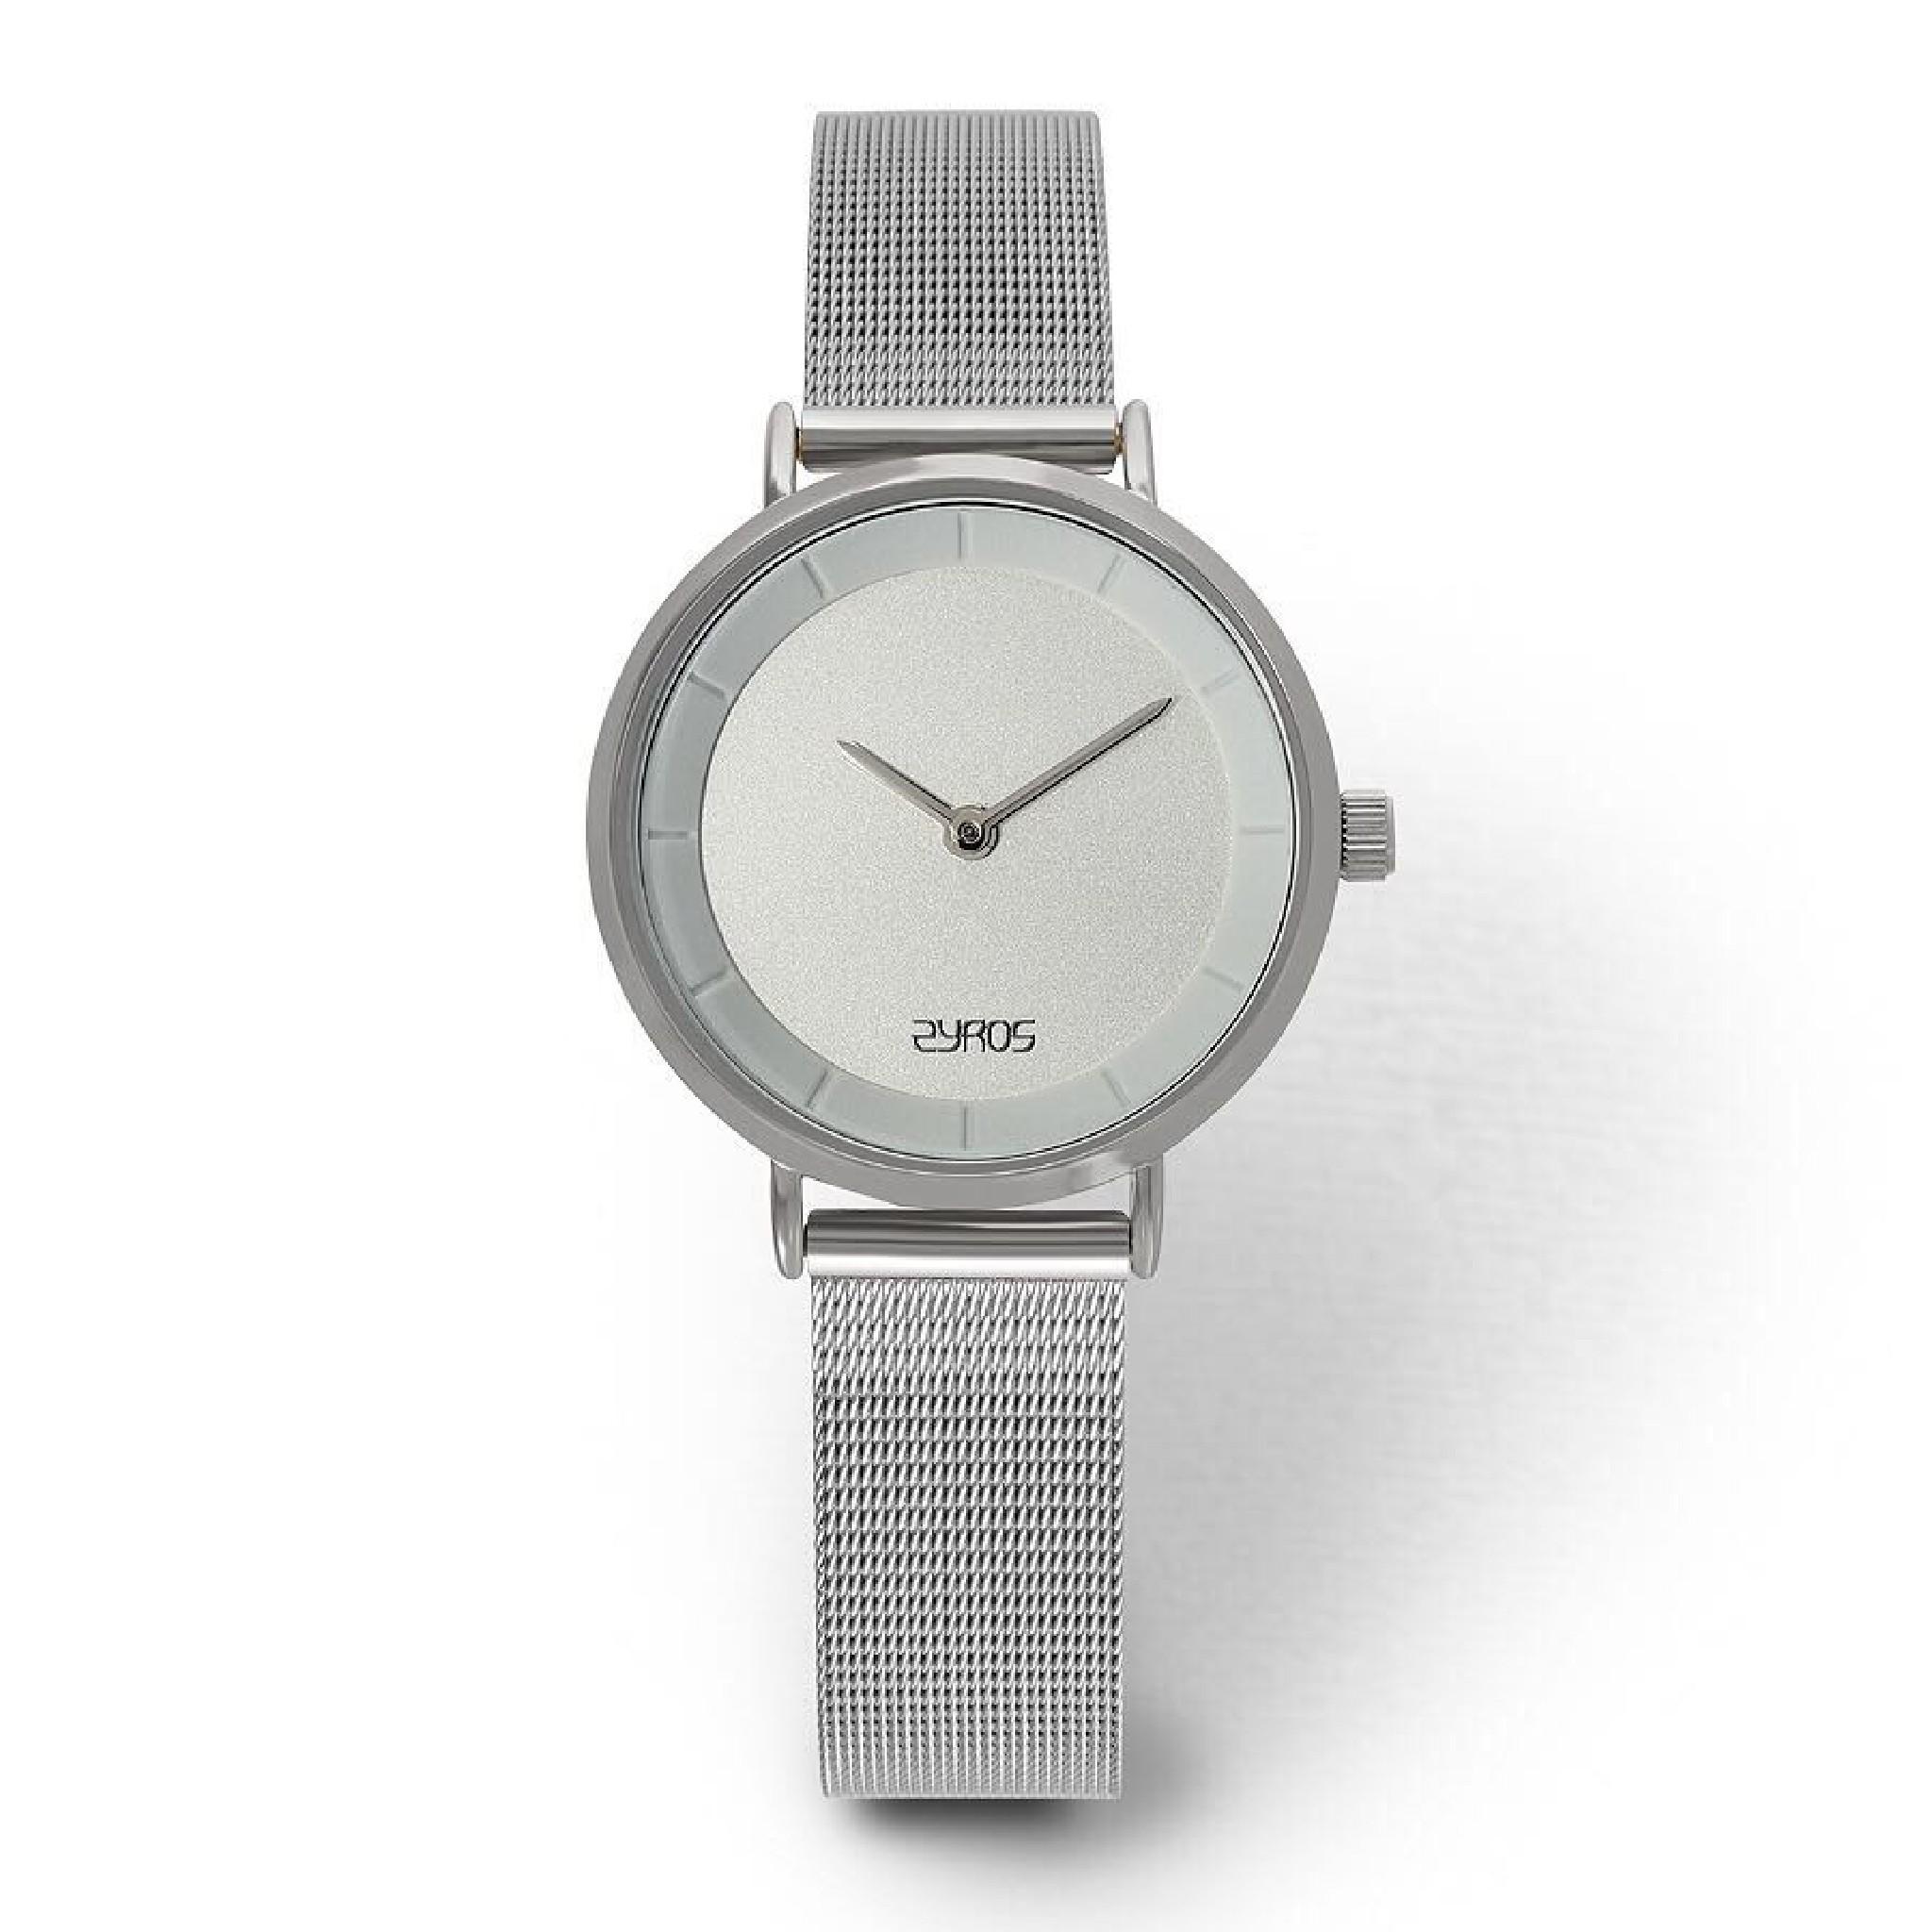 75bc8f097 ساعة زايروس نسائيه حديد | watches_box